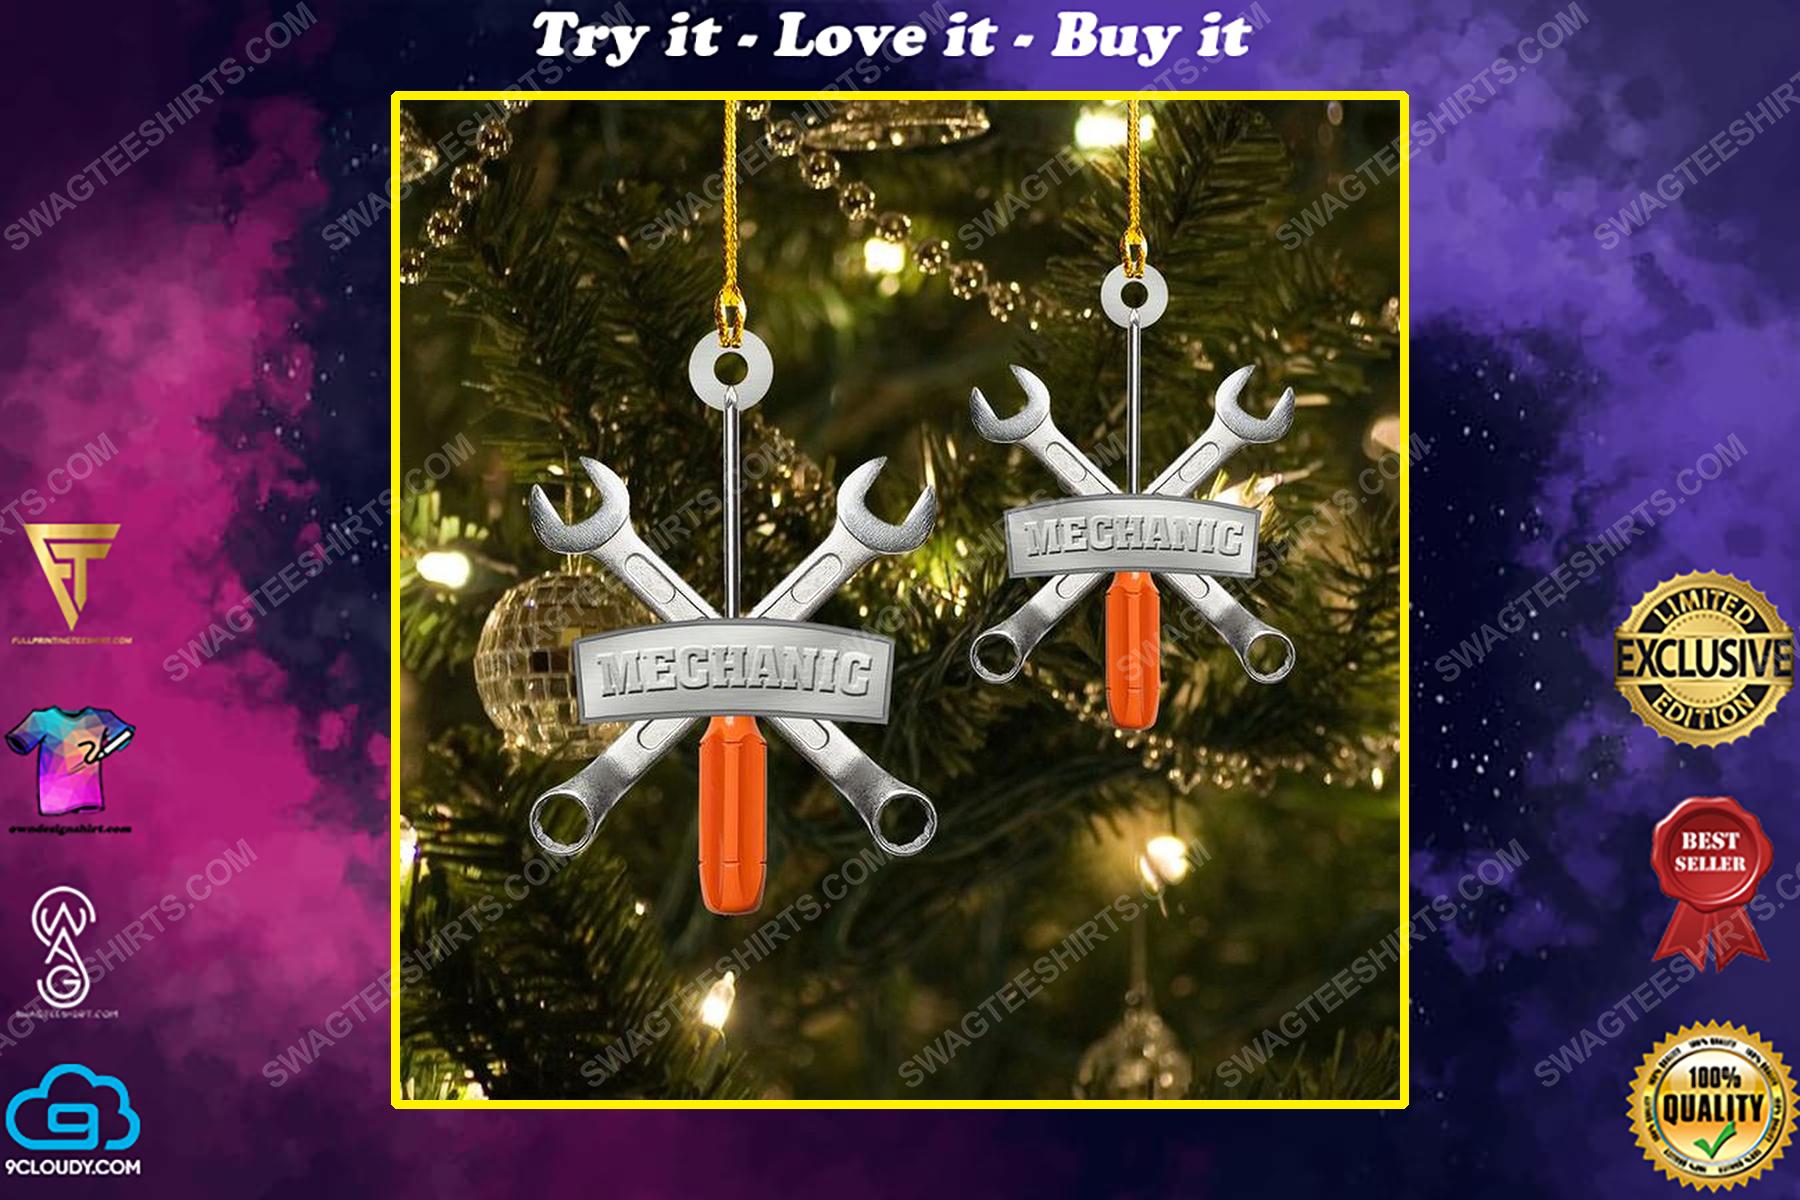 The mechanic christmas gift ornament